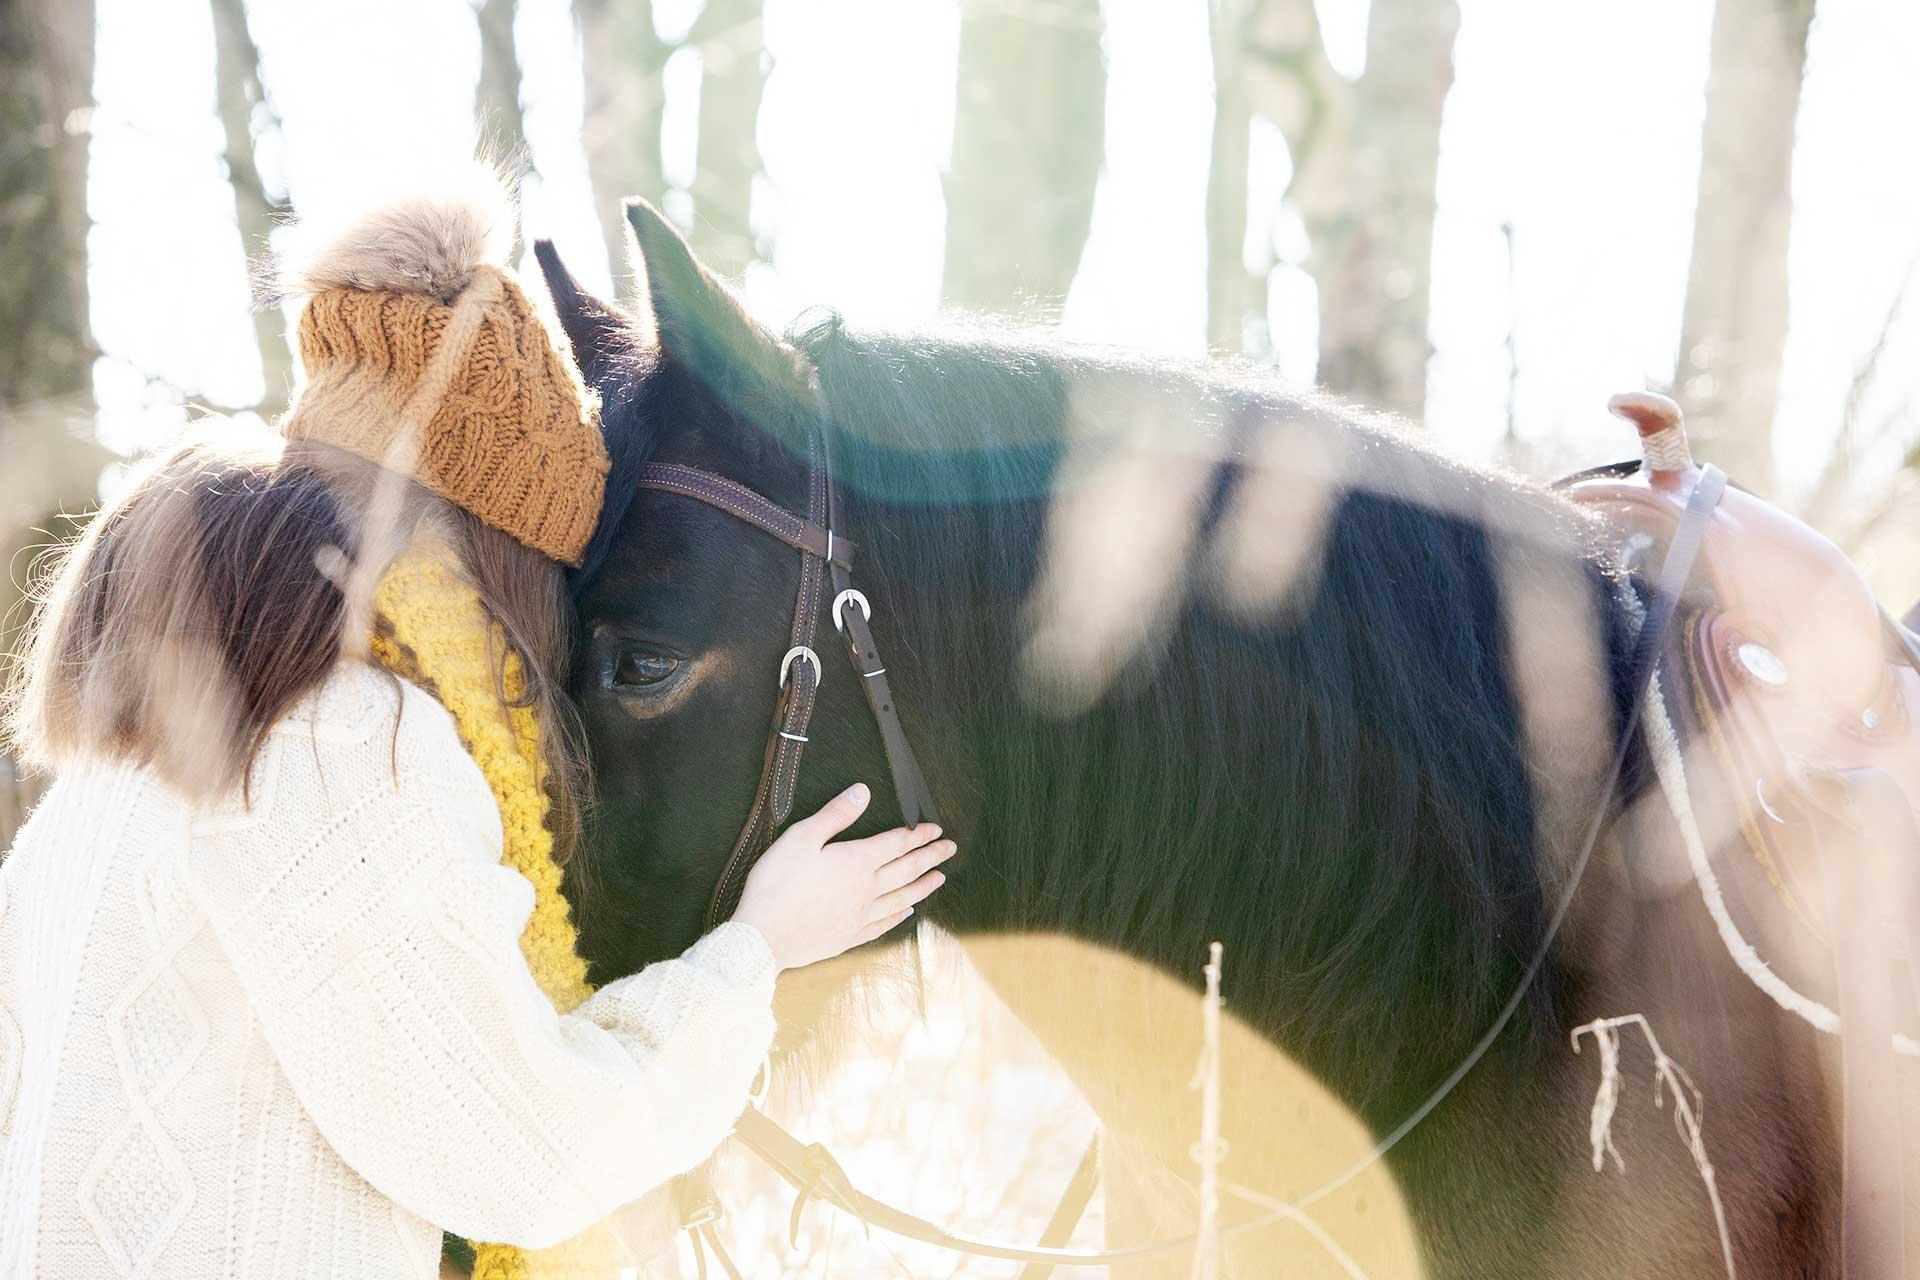 angela pfeiffer Fotografin, angela pfeiffer, pferdeshooting, pferdefotografie, pferdeshooting hamburg, pferdefoto, professionelle Pferdefotos, professionelles pferdeshooting, individuelle pferdefotos, pferdeportraits, fotos turnierpferde, turnierfotos, sportpferde fotos, fotografie, sportpferdefotografie, portrait mit Pferd, Shooting mit Pferd